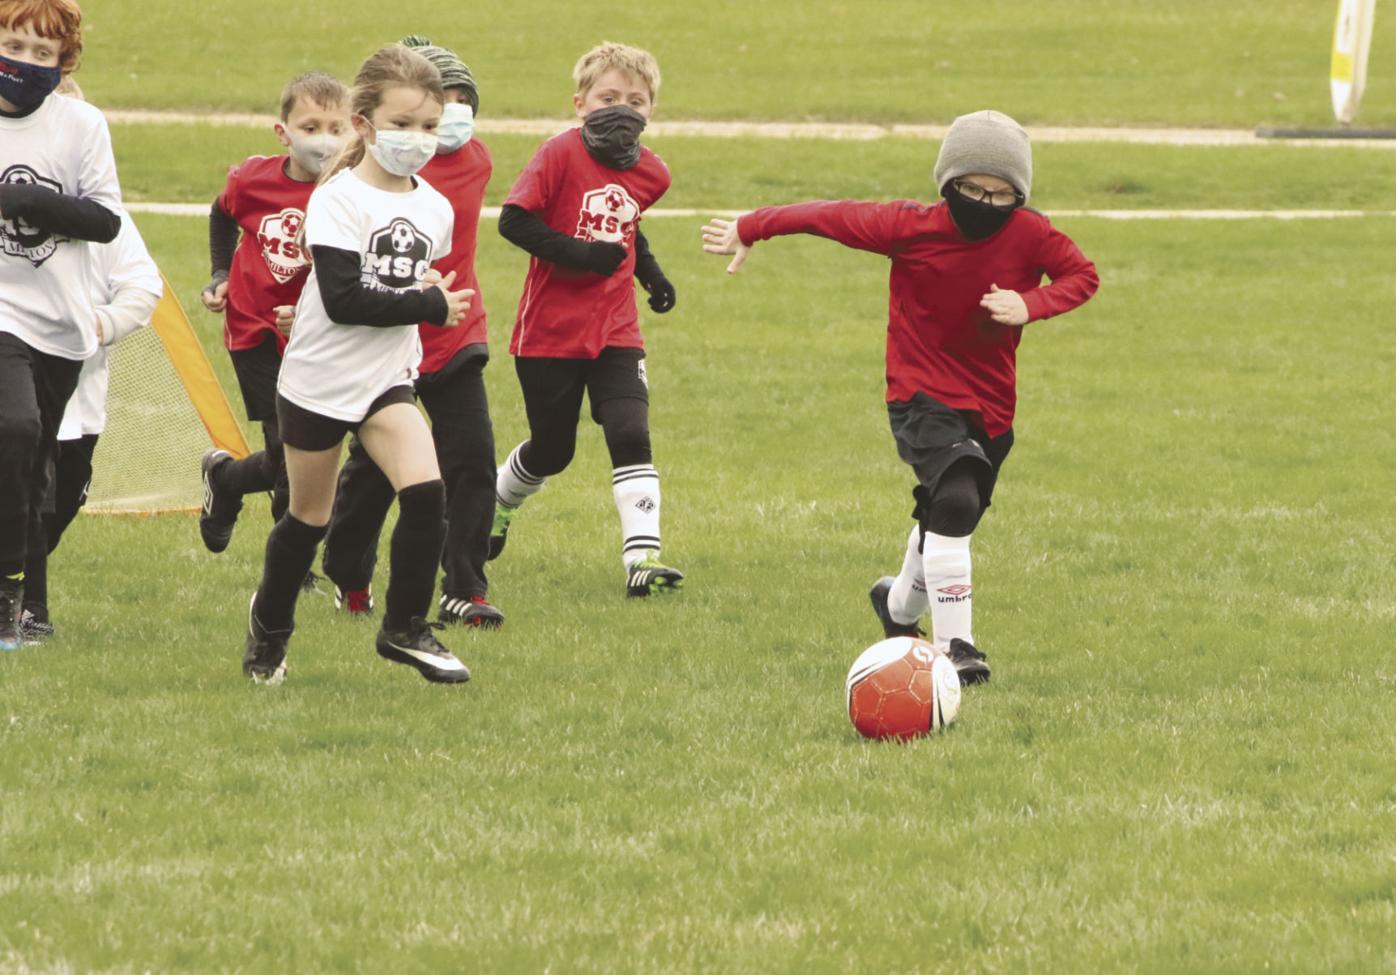 Milton Soccer Club